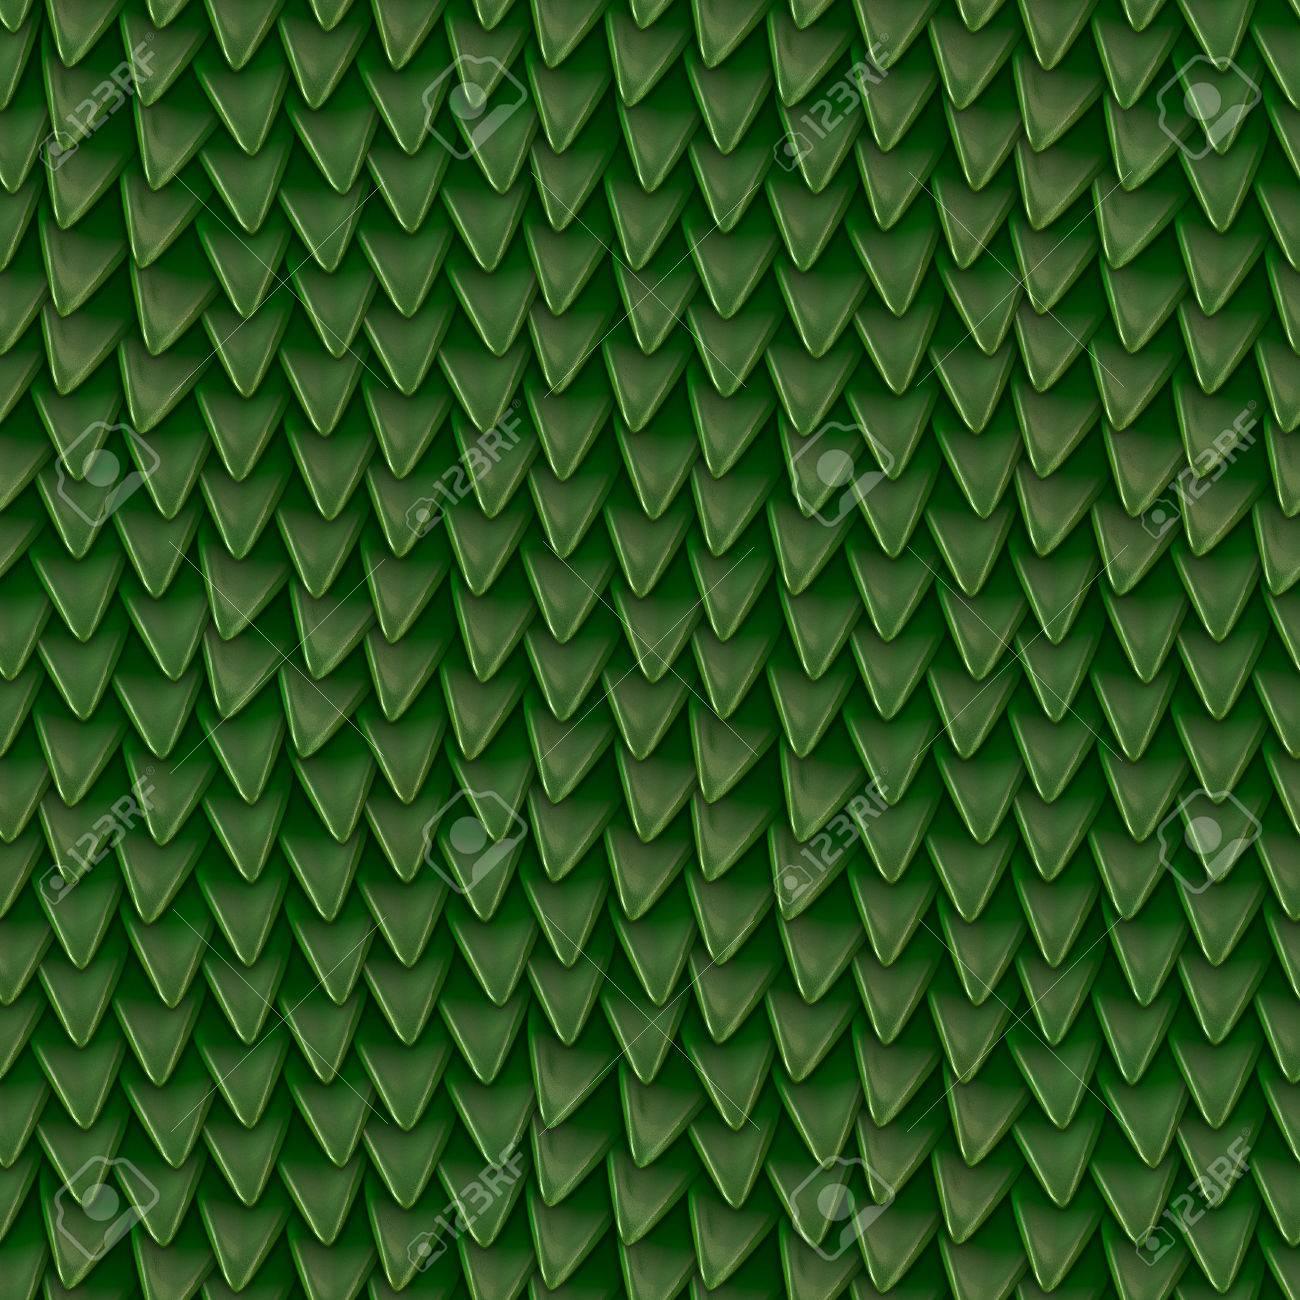 seamless texture of metallic dragon scales reptile skin pattern